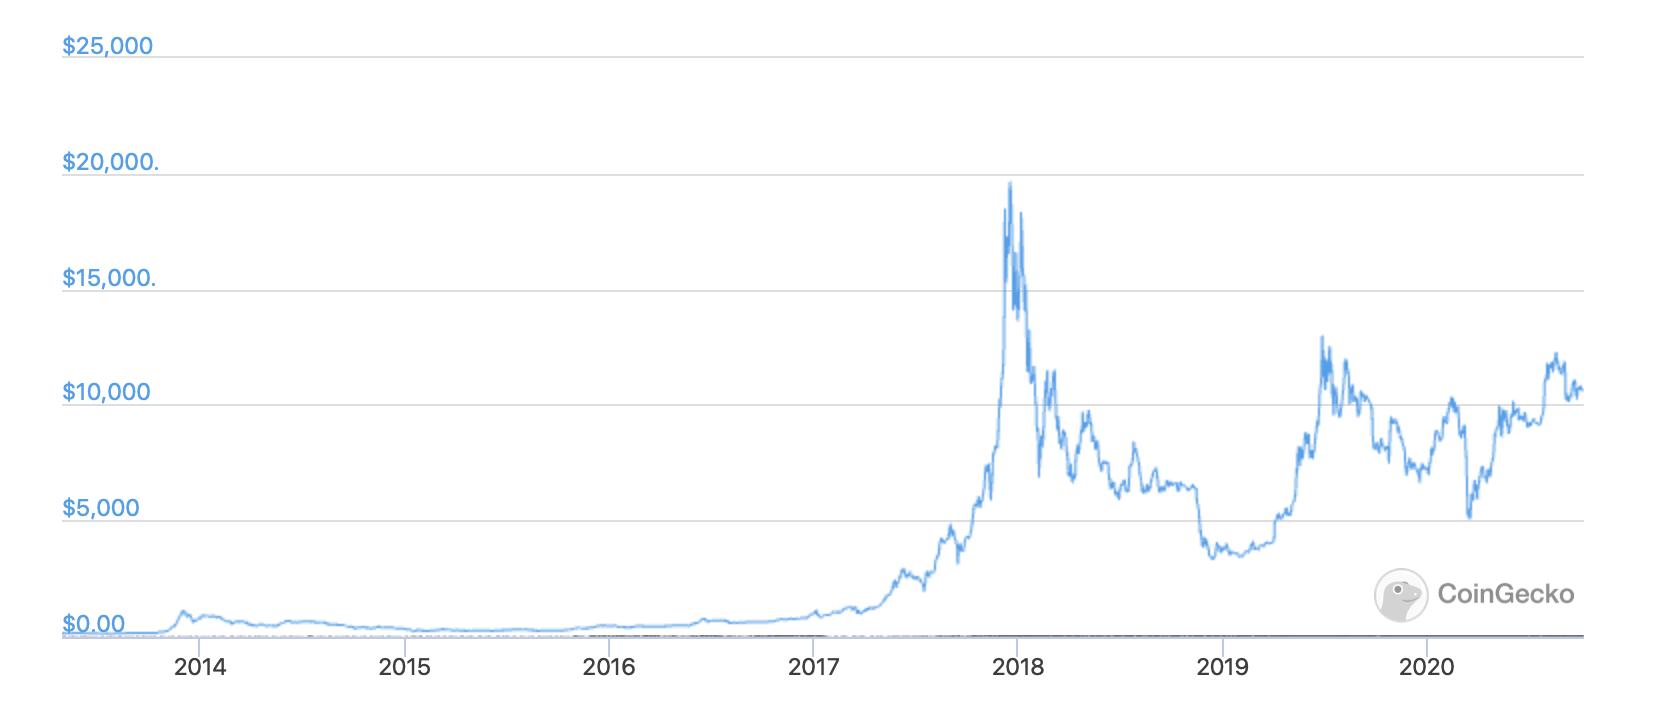 BTC price coingecko